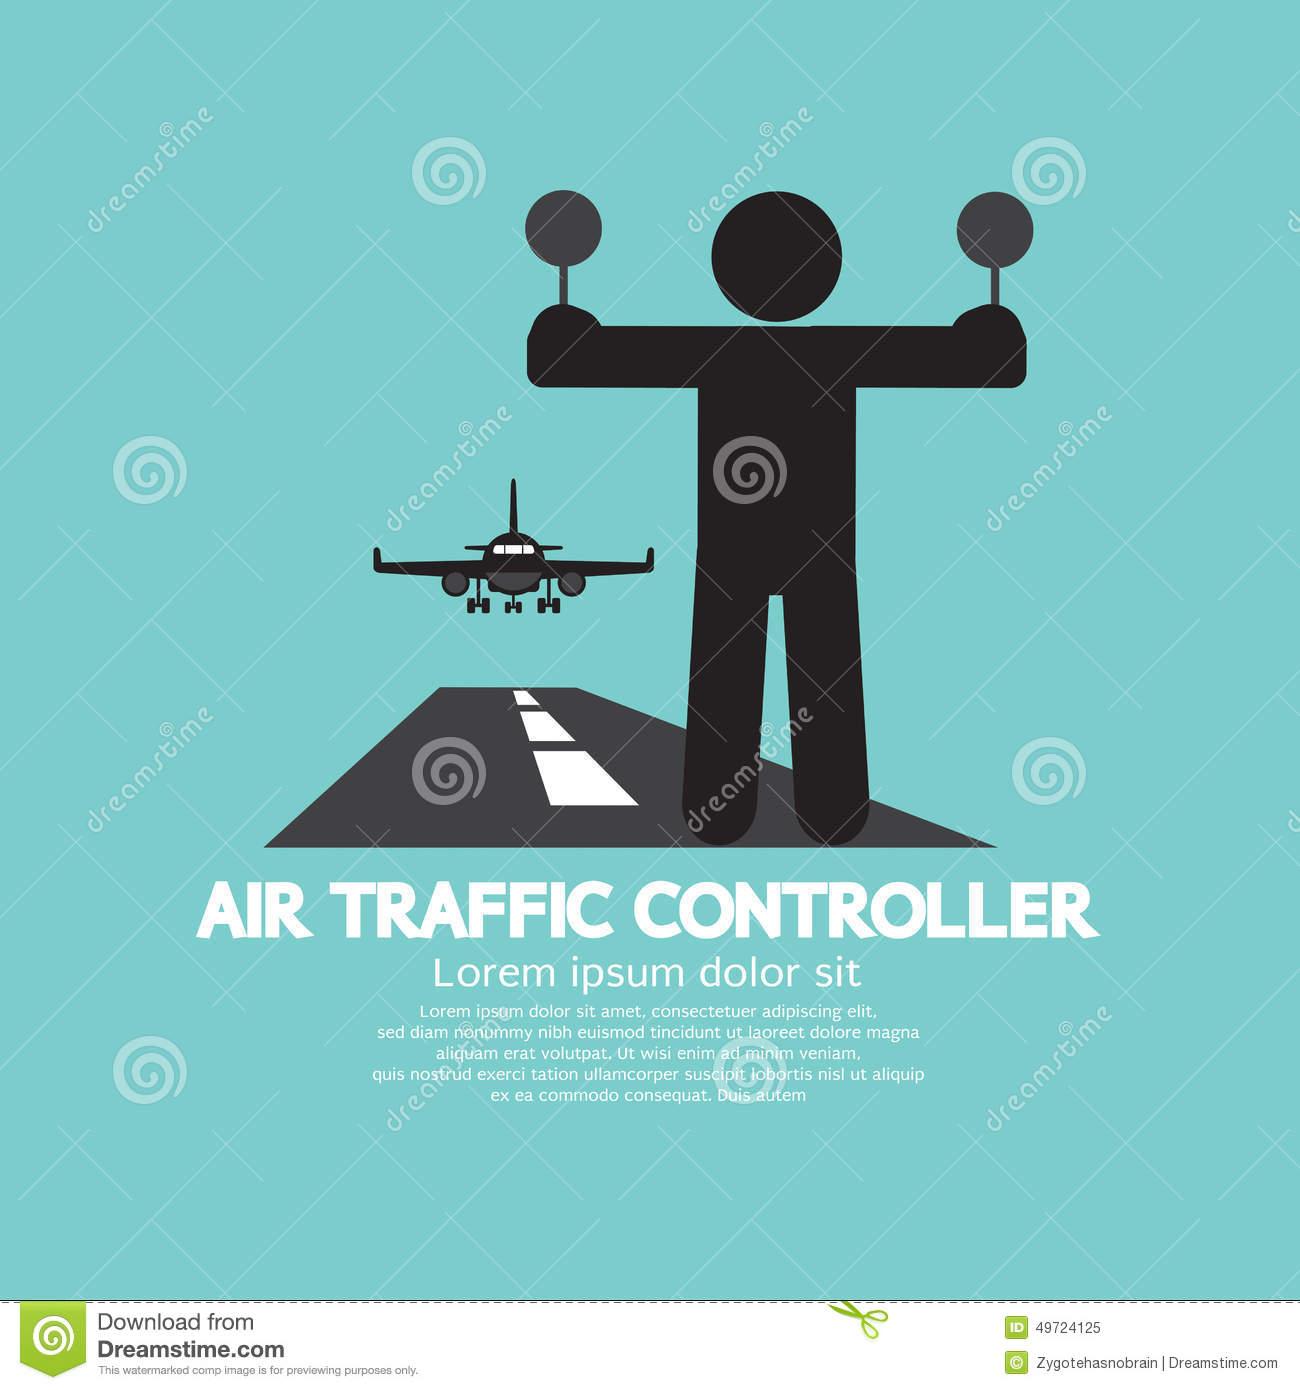 Air Traffic Controller Stock Illustrations.